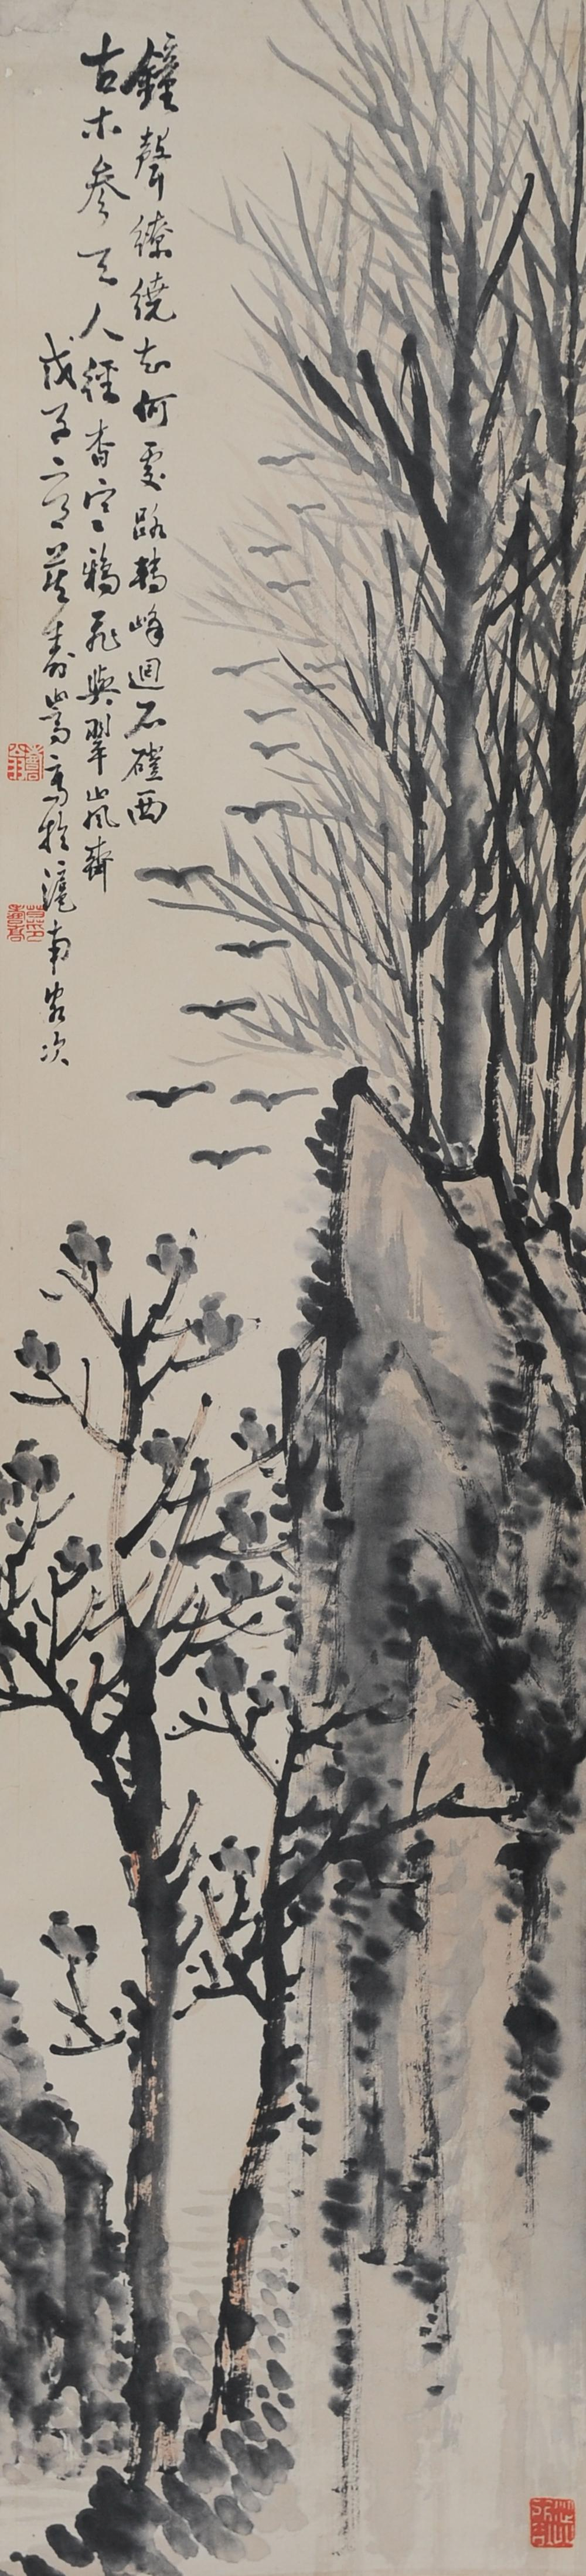 Summer Asian Art & Antiques Auction